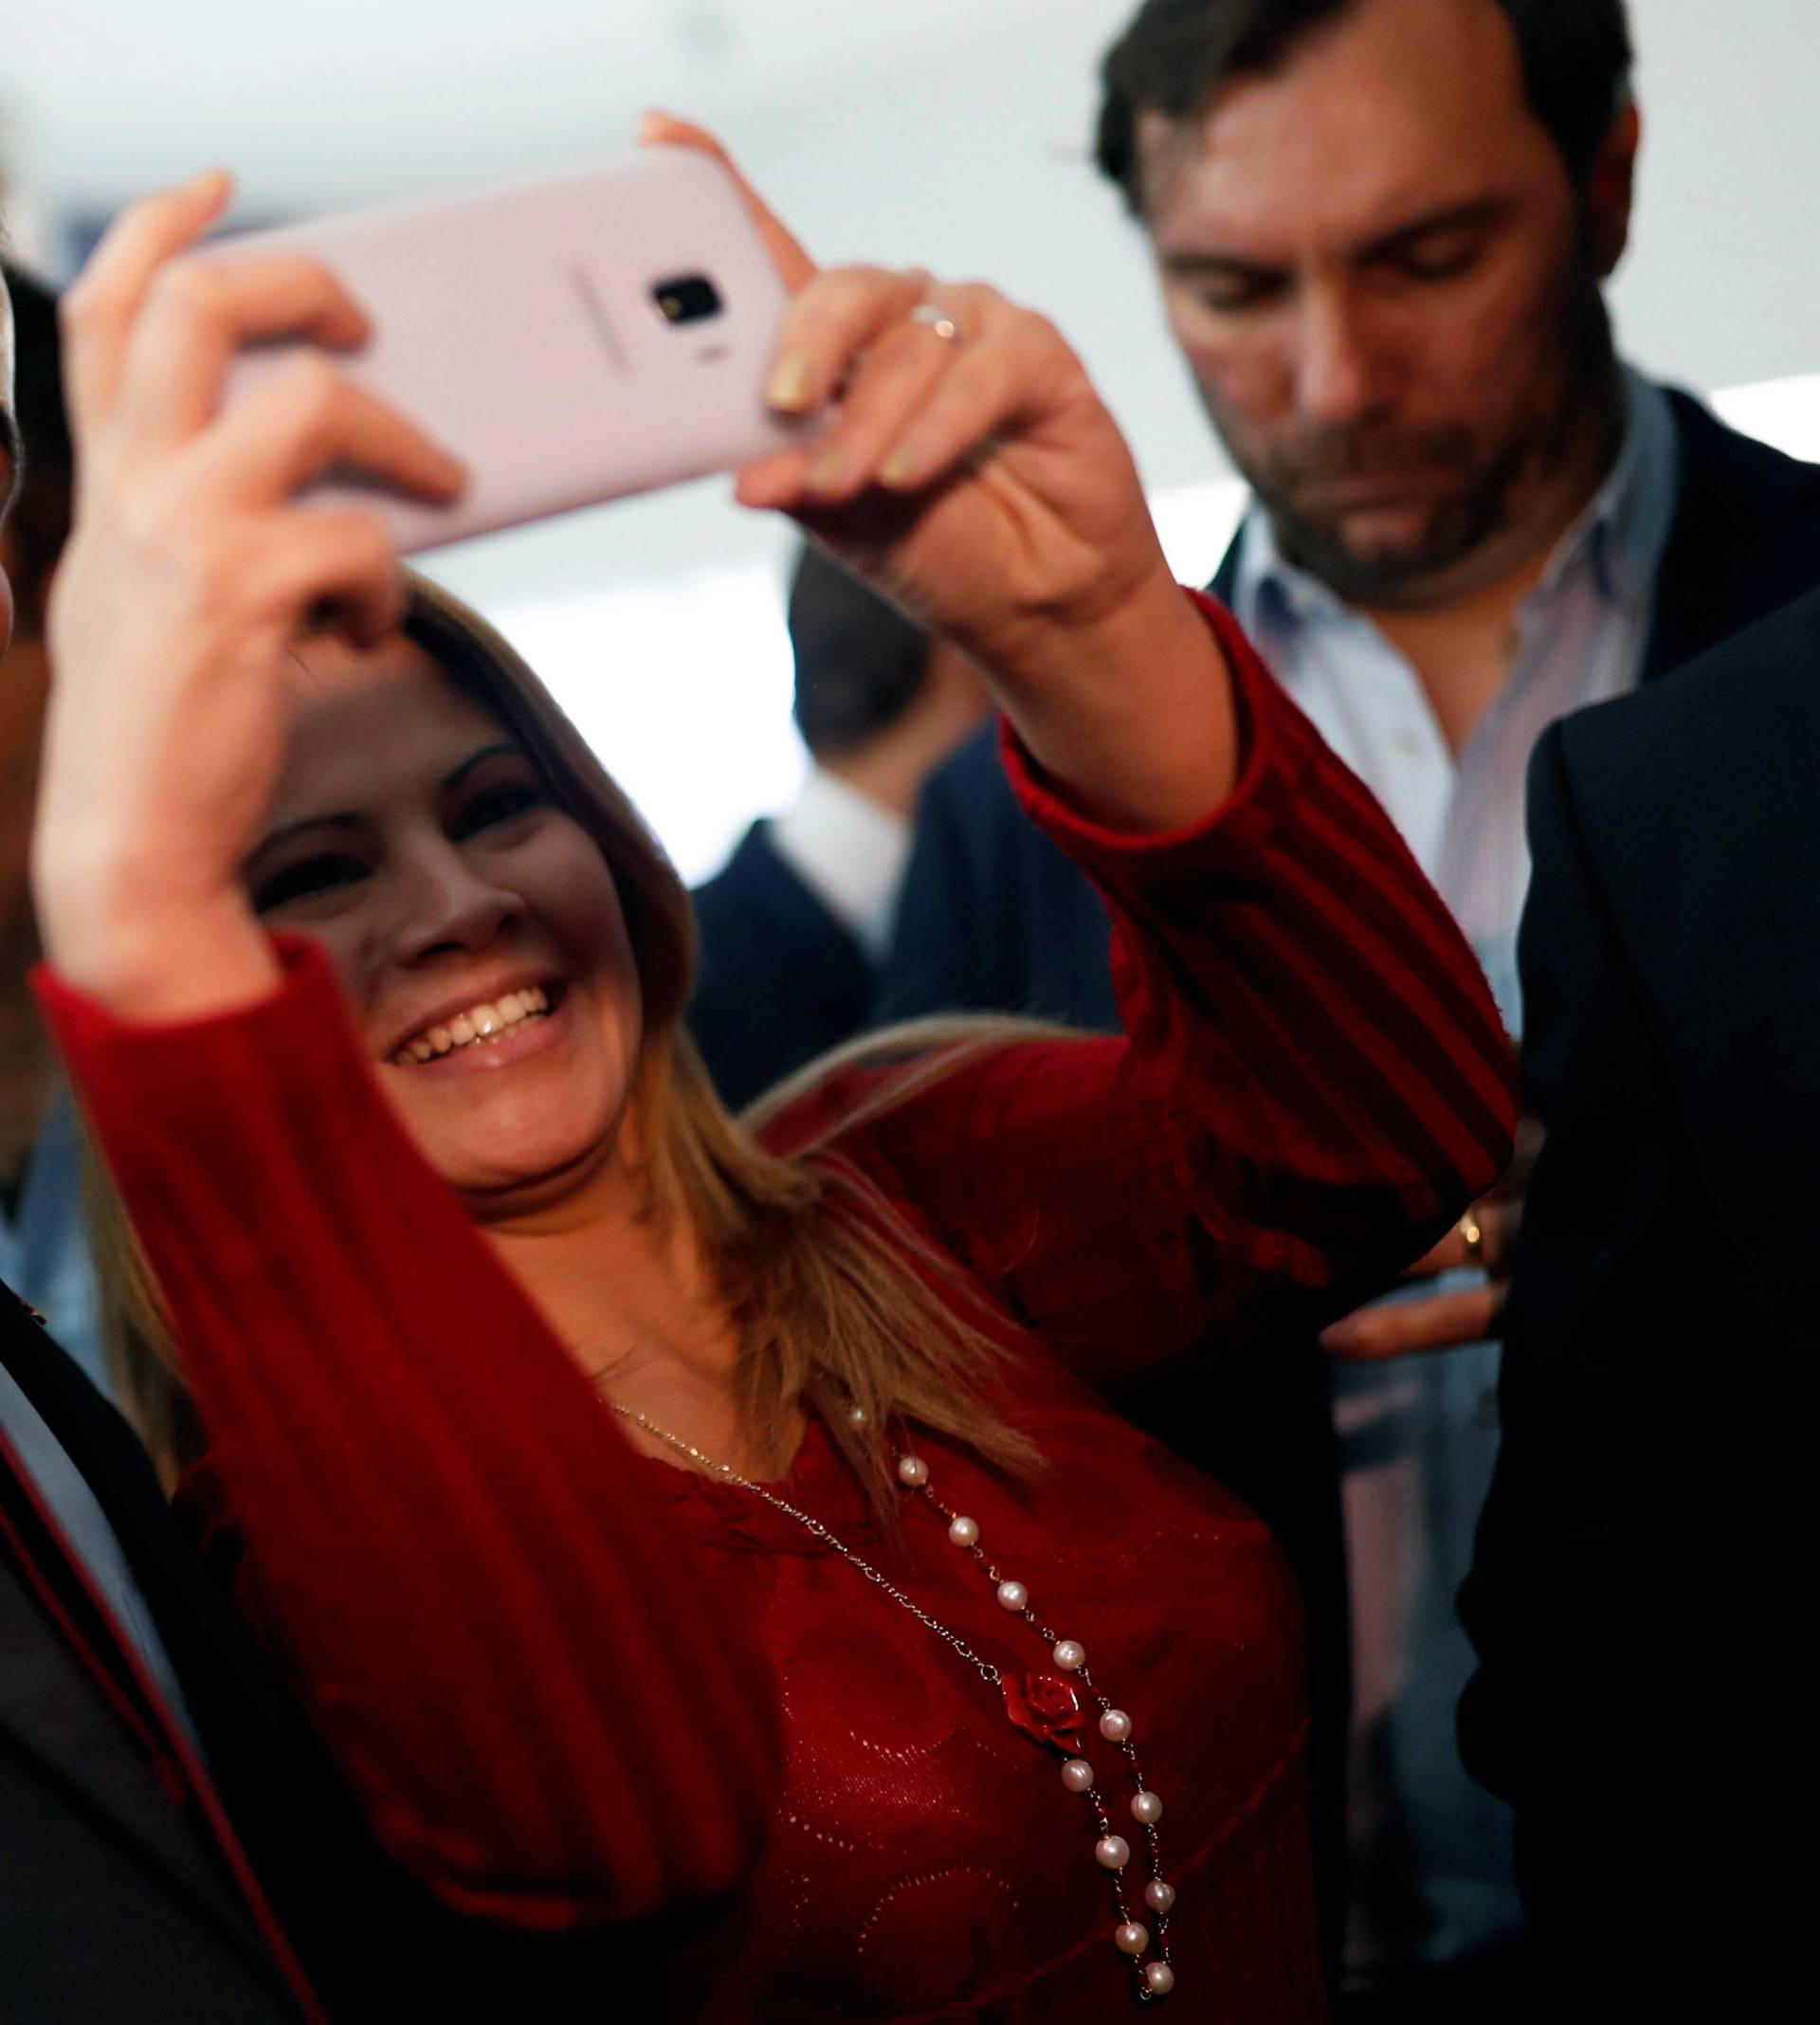 Venezuelan opposition leader Juan Guaido attends a meeting with representatives of FEDEAGRO in Caracas